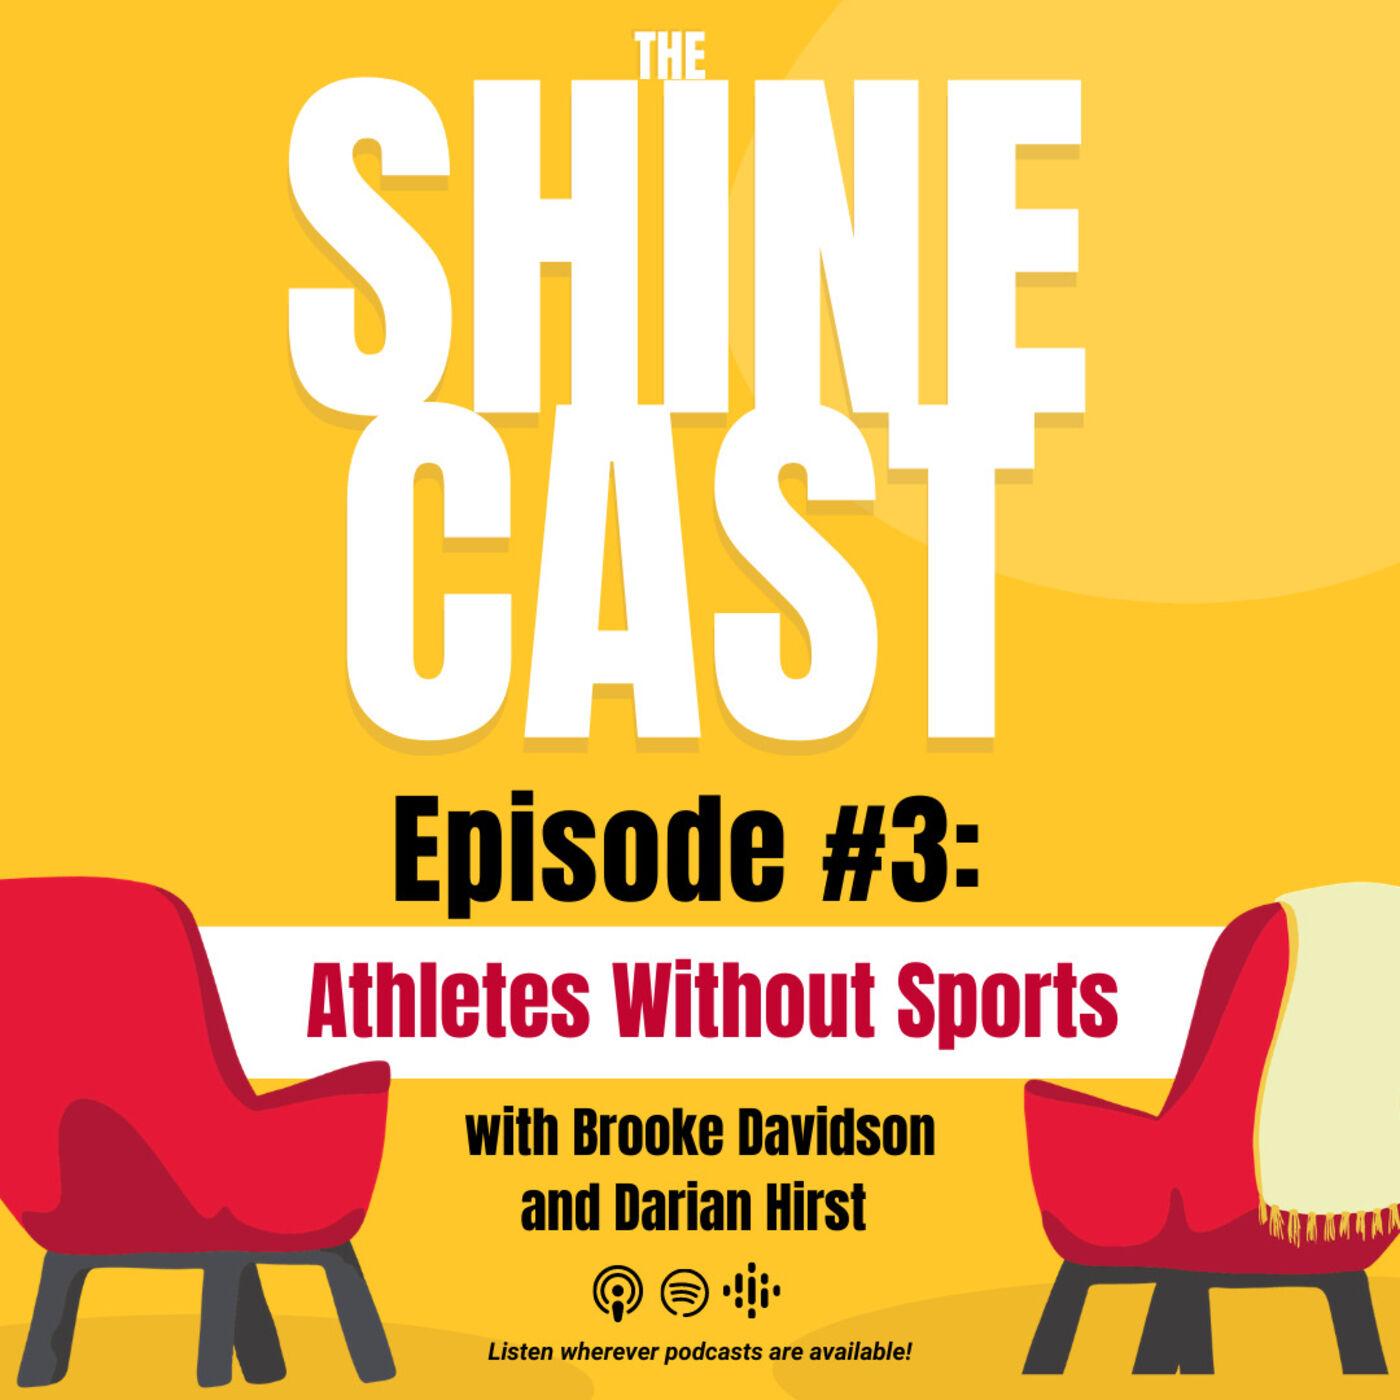 Episode 3: Brooke & Darian - Athletes Without Sports